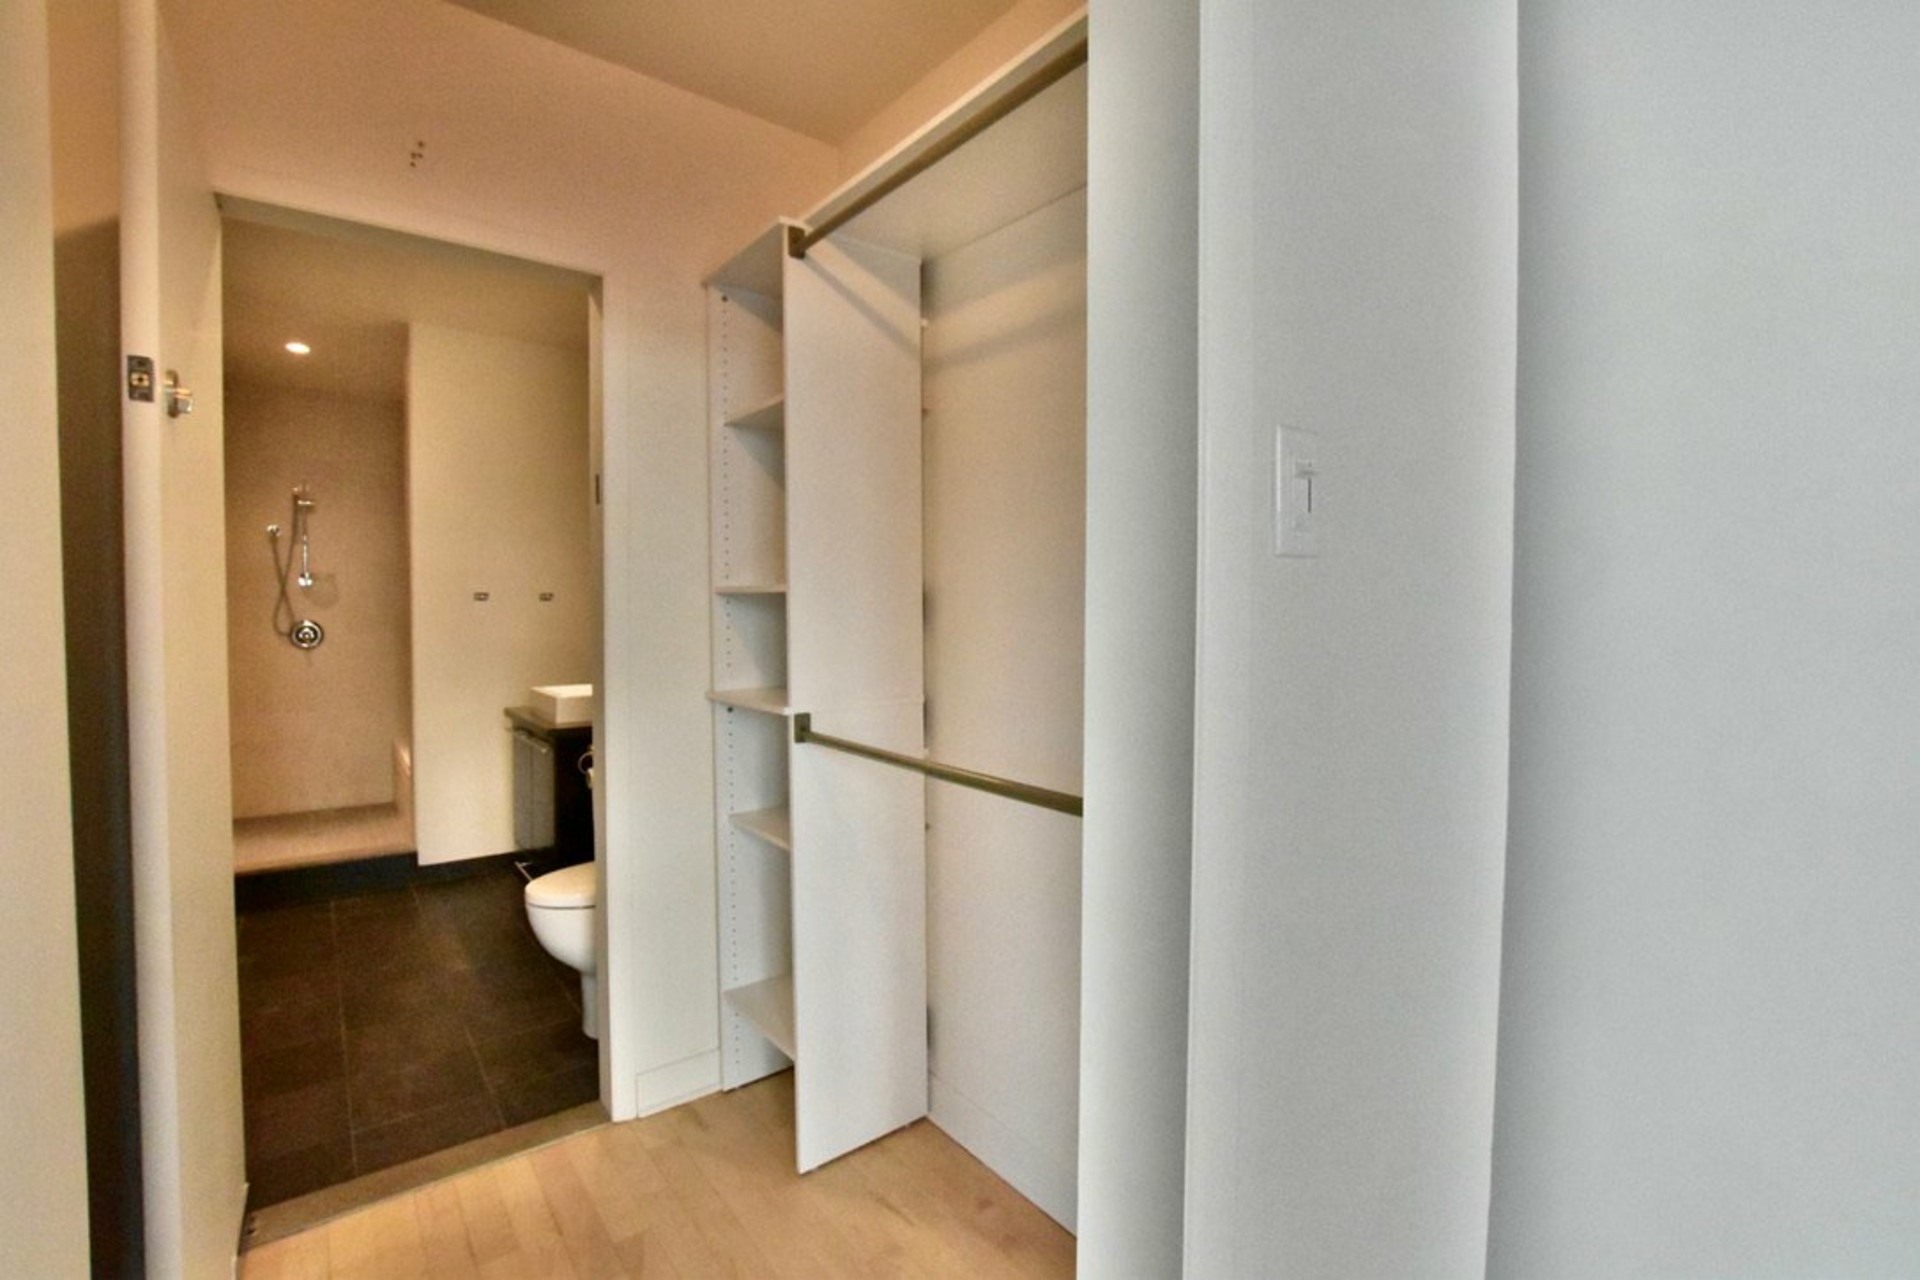 image 22 - Departamento Para alquiler Villeray/Saint-Michel/Parc-Extension Montréal  - 3 habitaciones